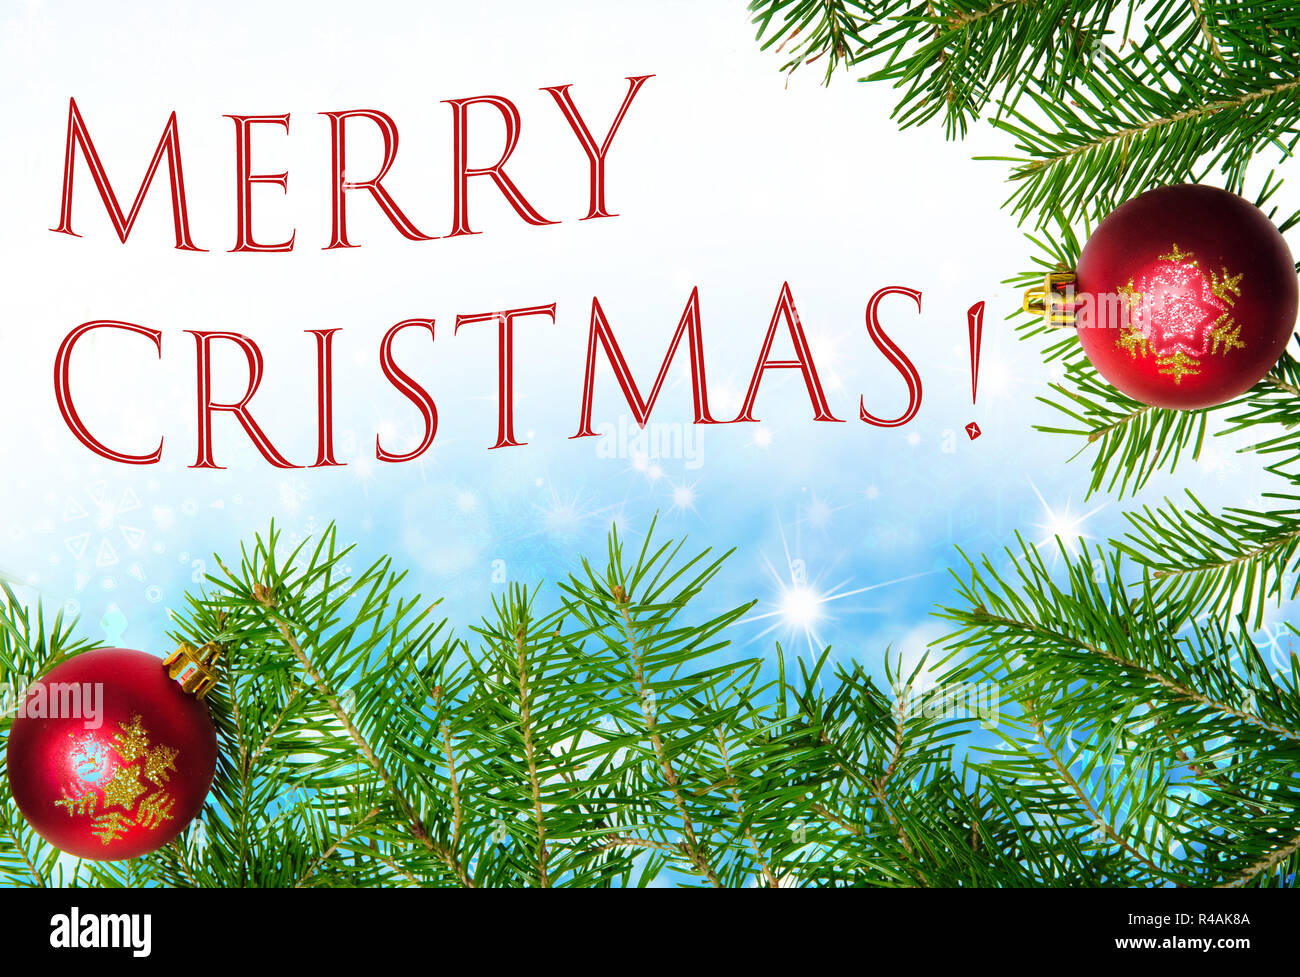 Christmas Greetings Background.Merry Christmas Seasons Greetings Blue Sparking Background